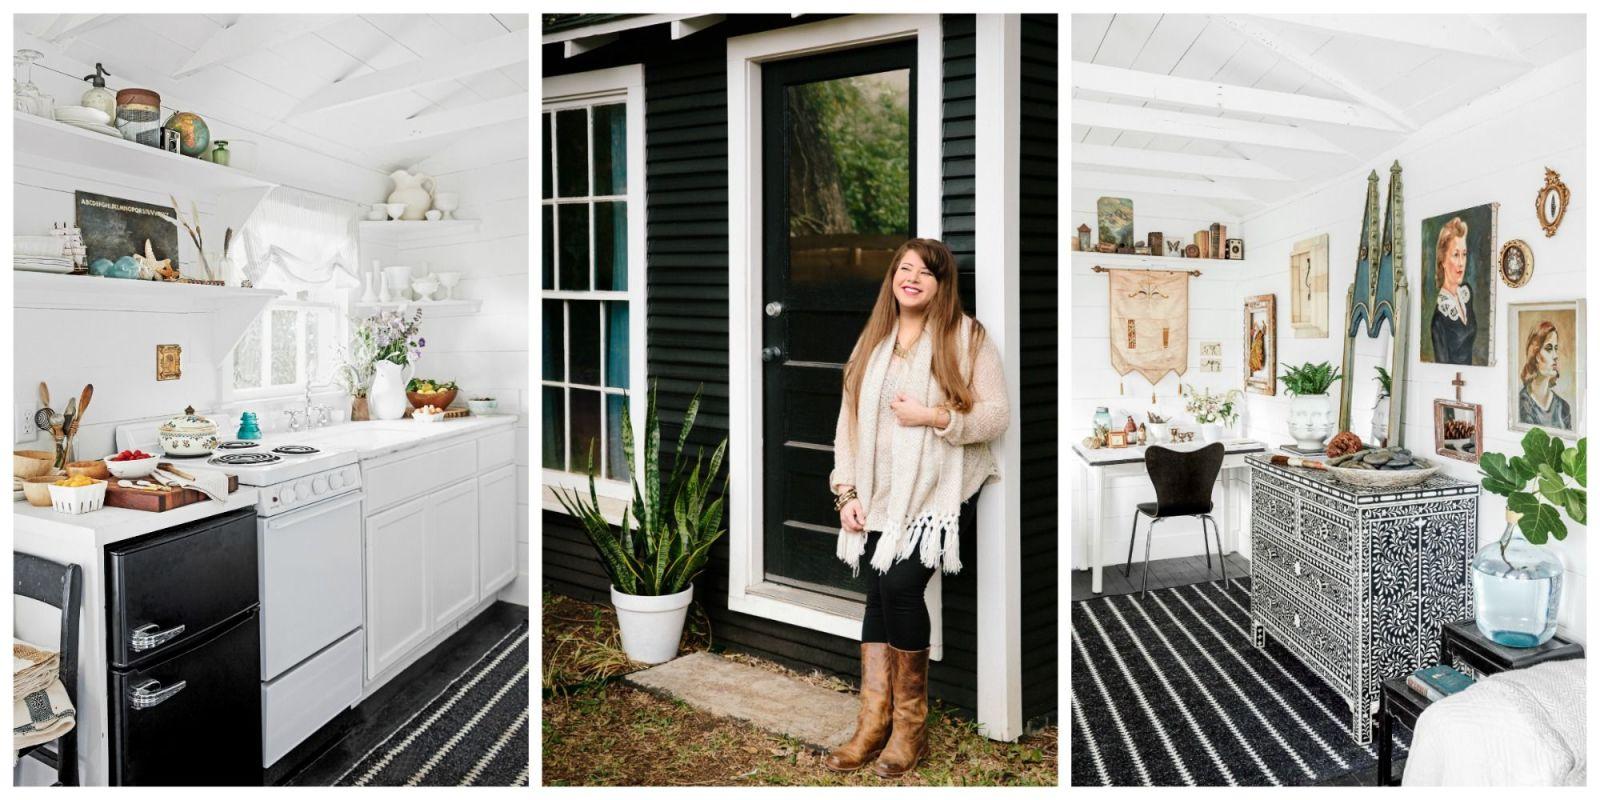 Small Home Decorating Ideas Tumbleweed Tiny House